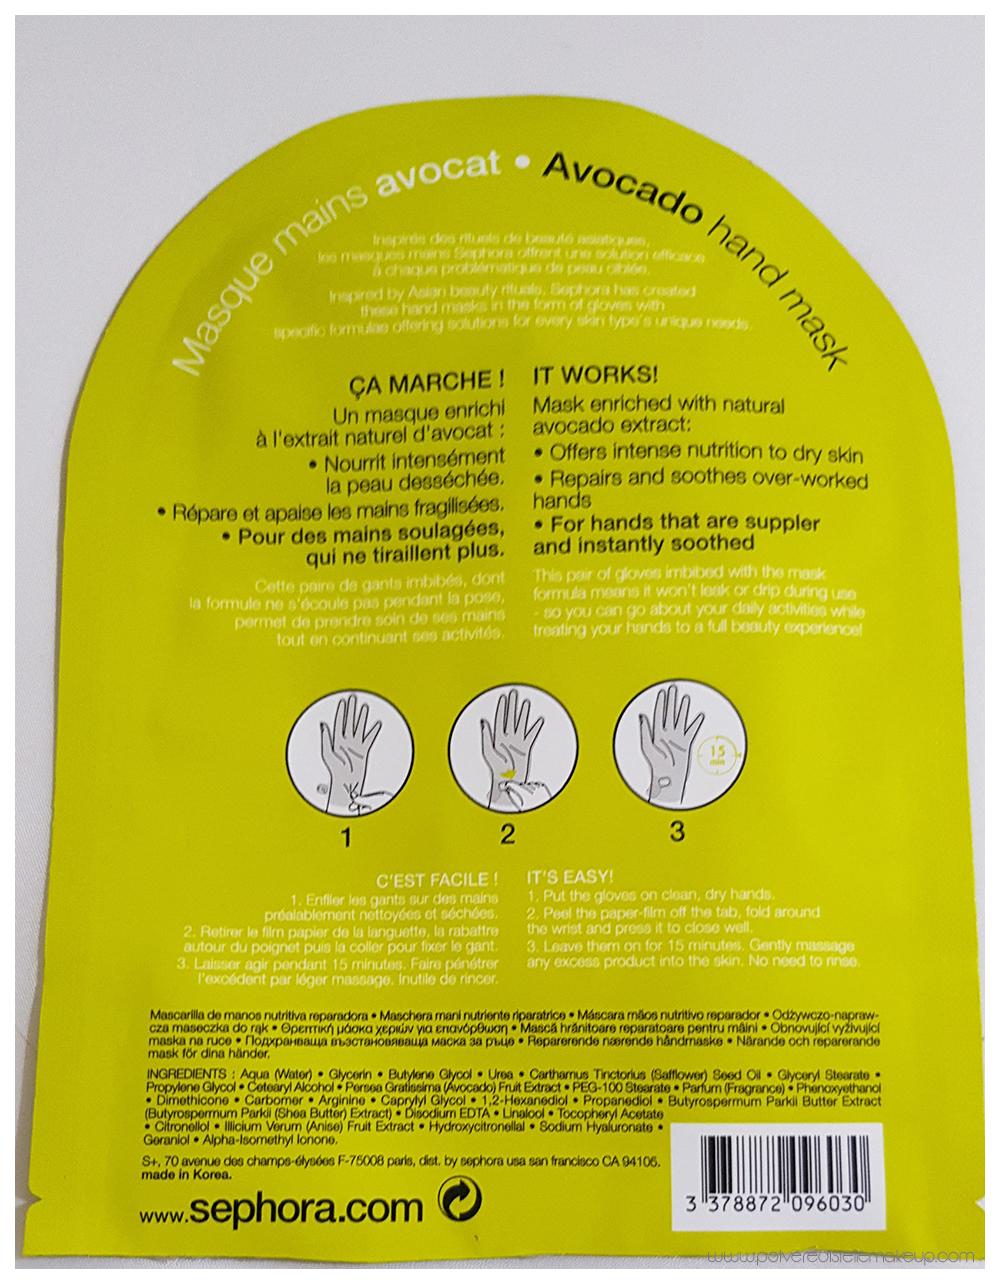 Maschera mani Sephora Avocado